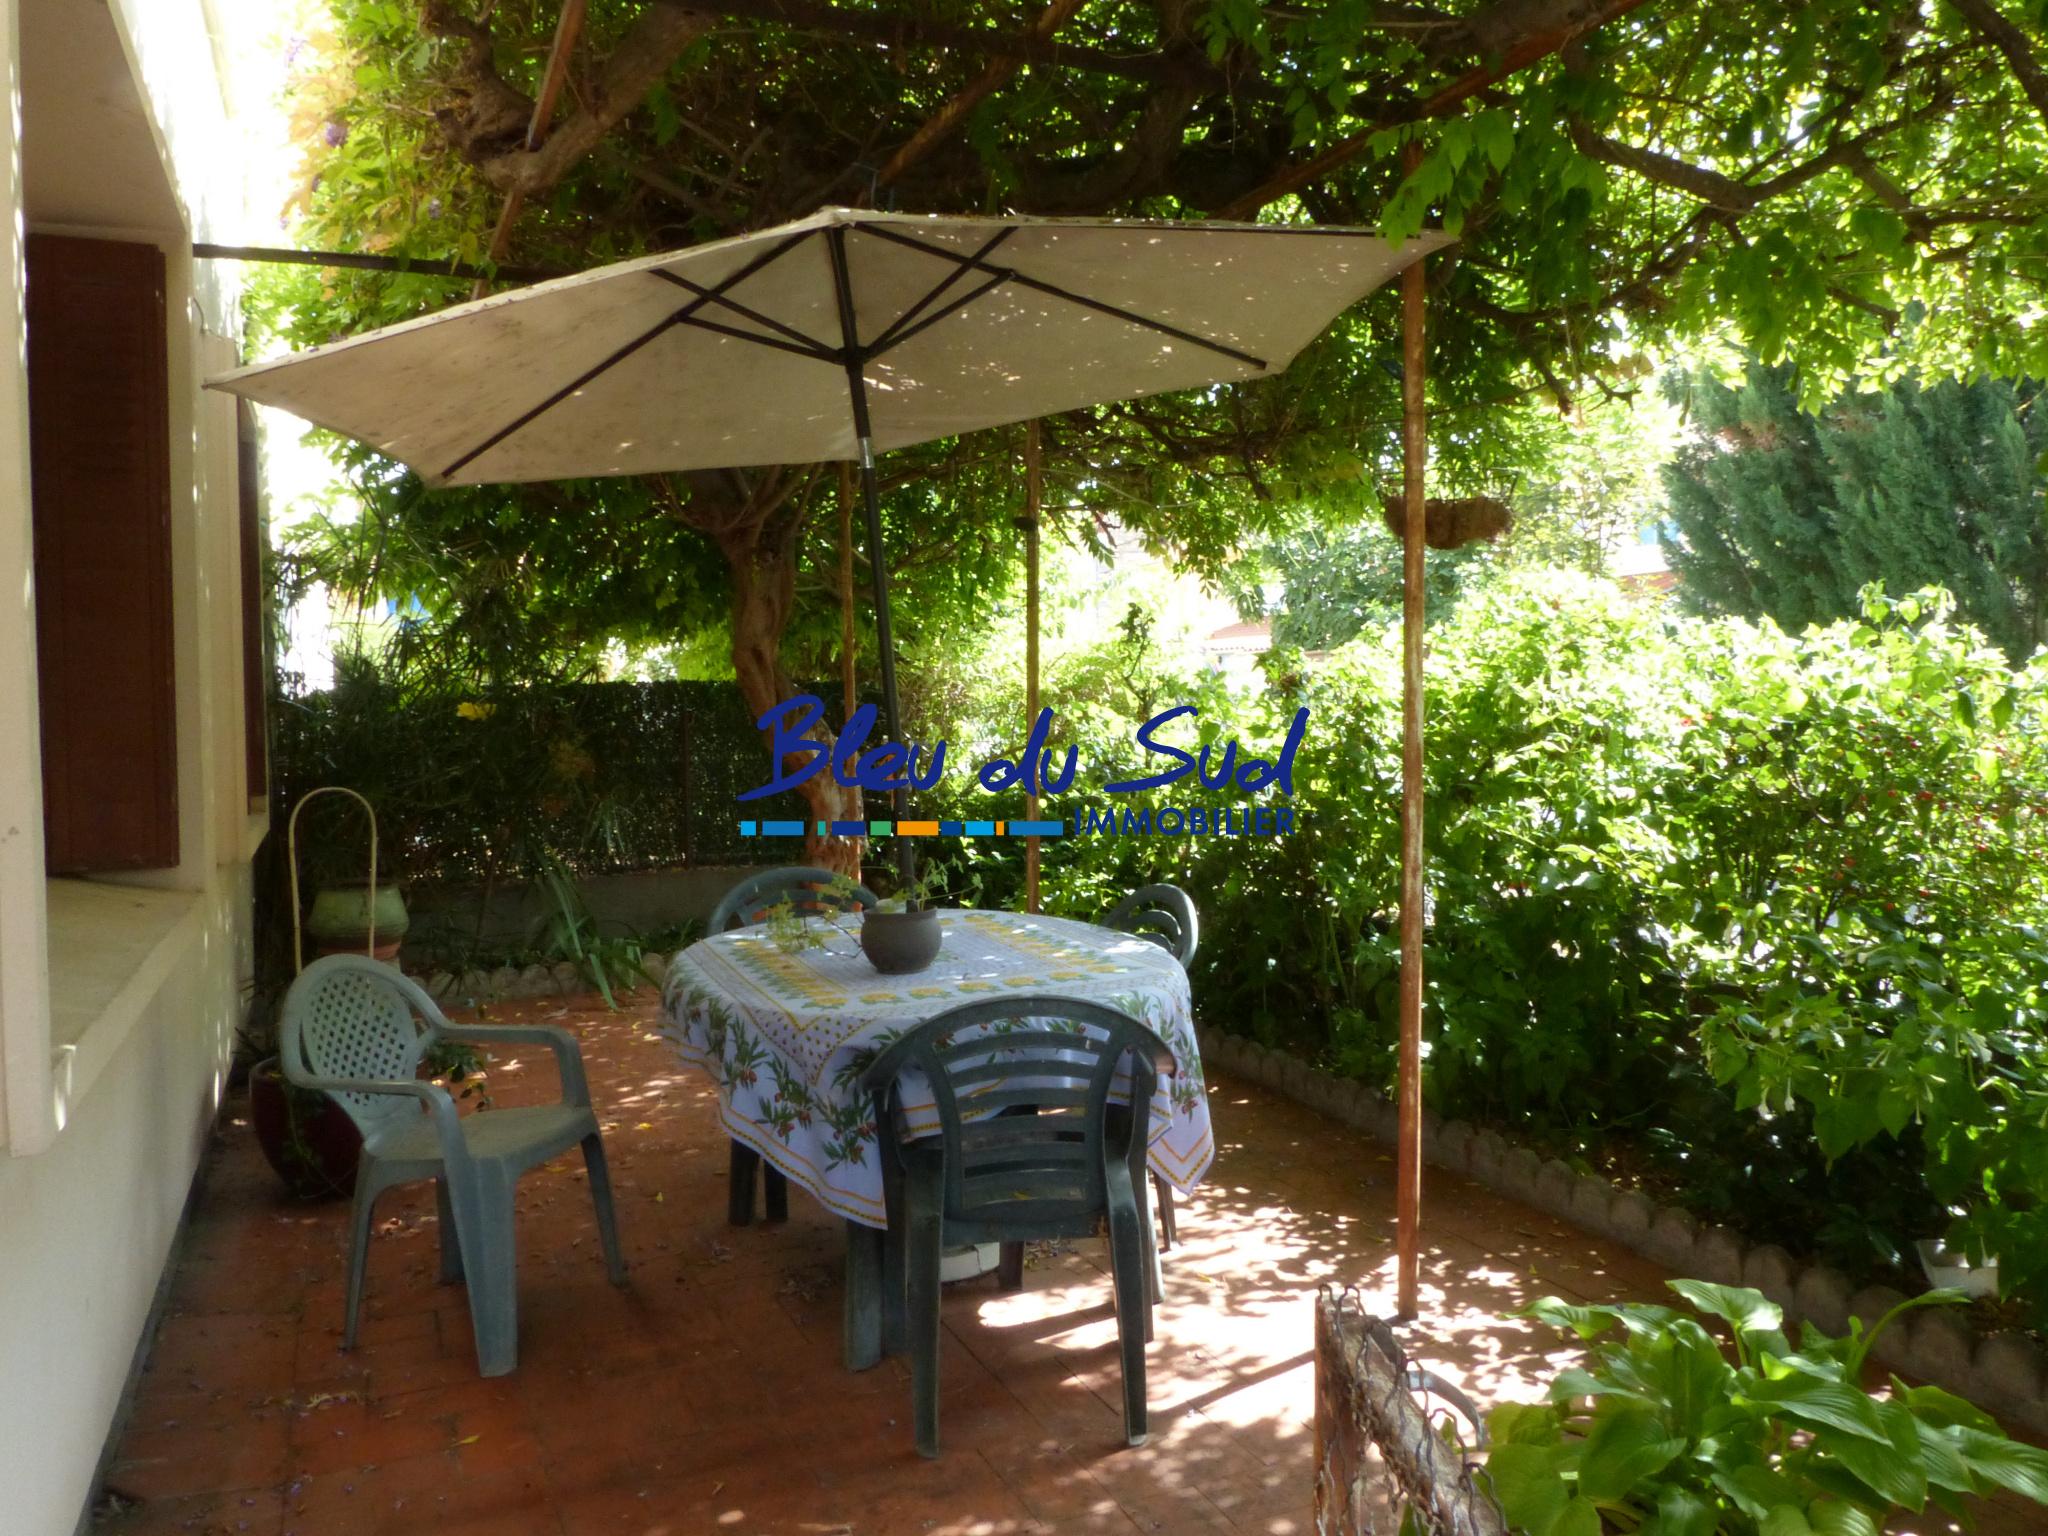 Vente Maison 3 Faces Avec Veranda Garage Et Jardin Arbore